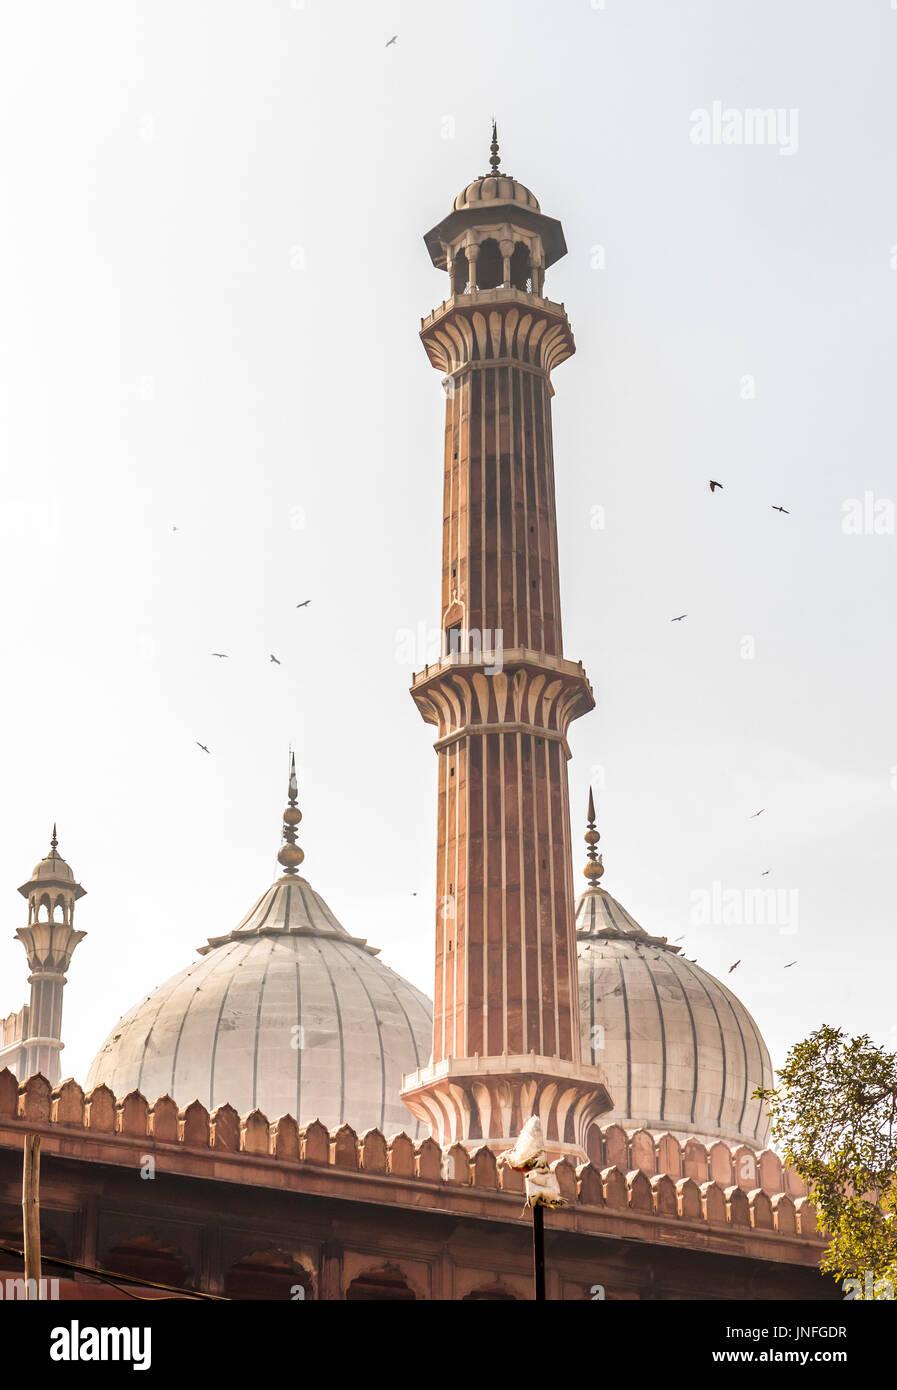 Jama Masjid in Delhi, India - Stock Image